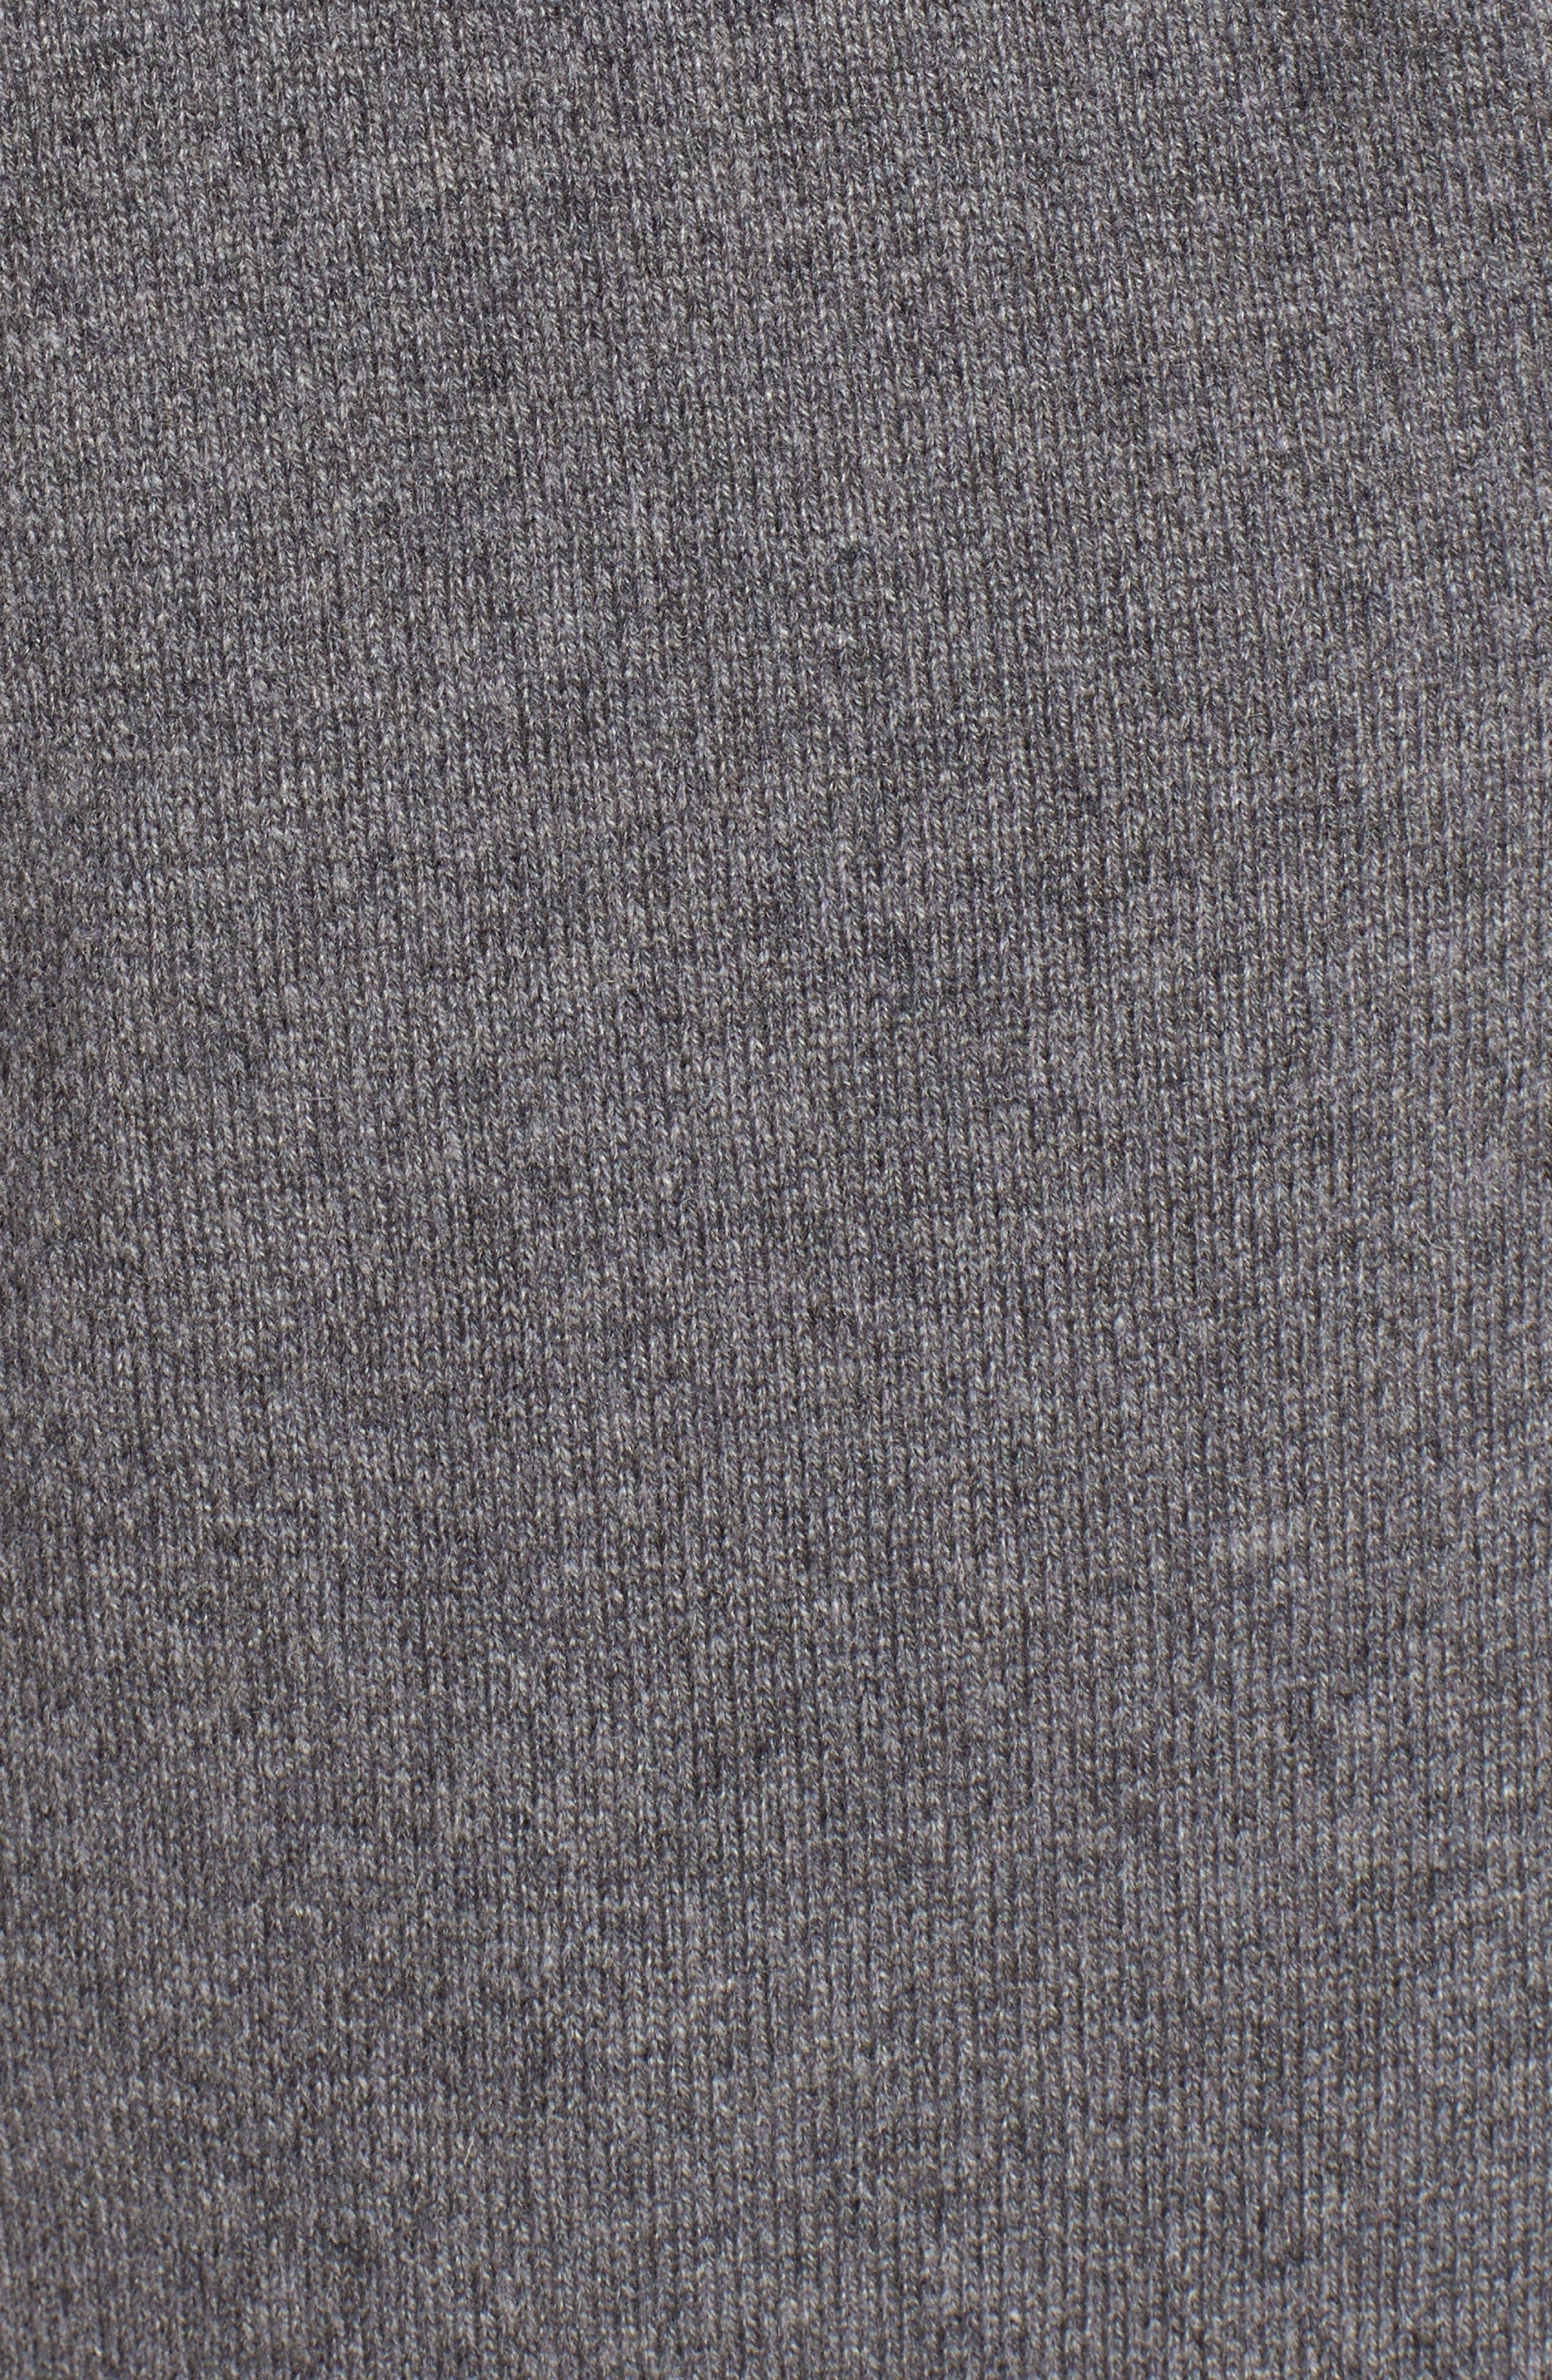 Side Tie Cashmere Blend Cardigan,                             Alternate thumbnail 5, color,